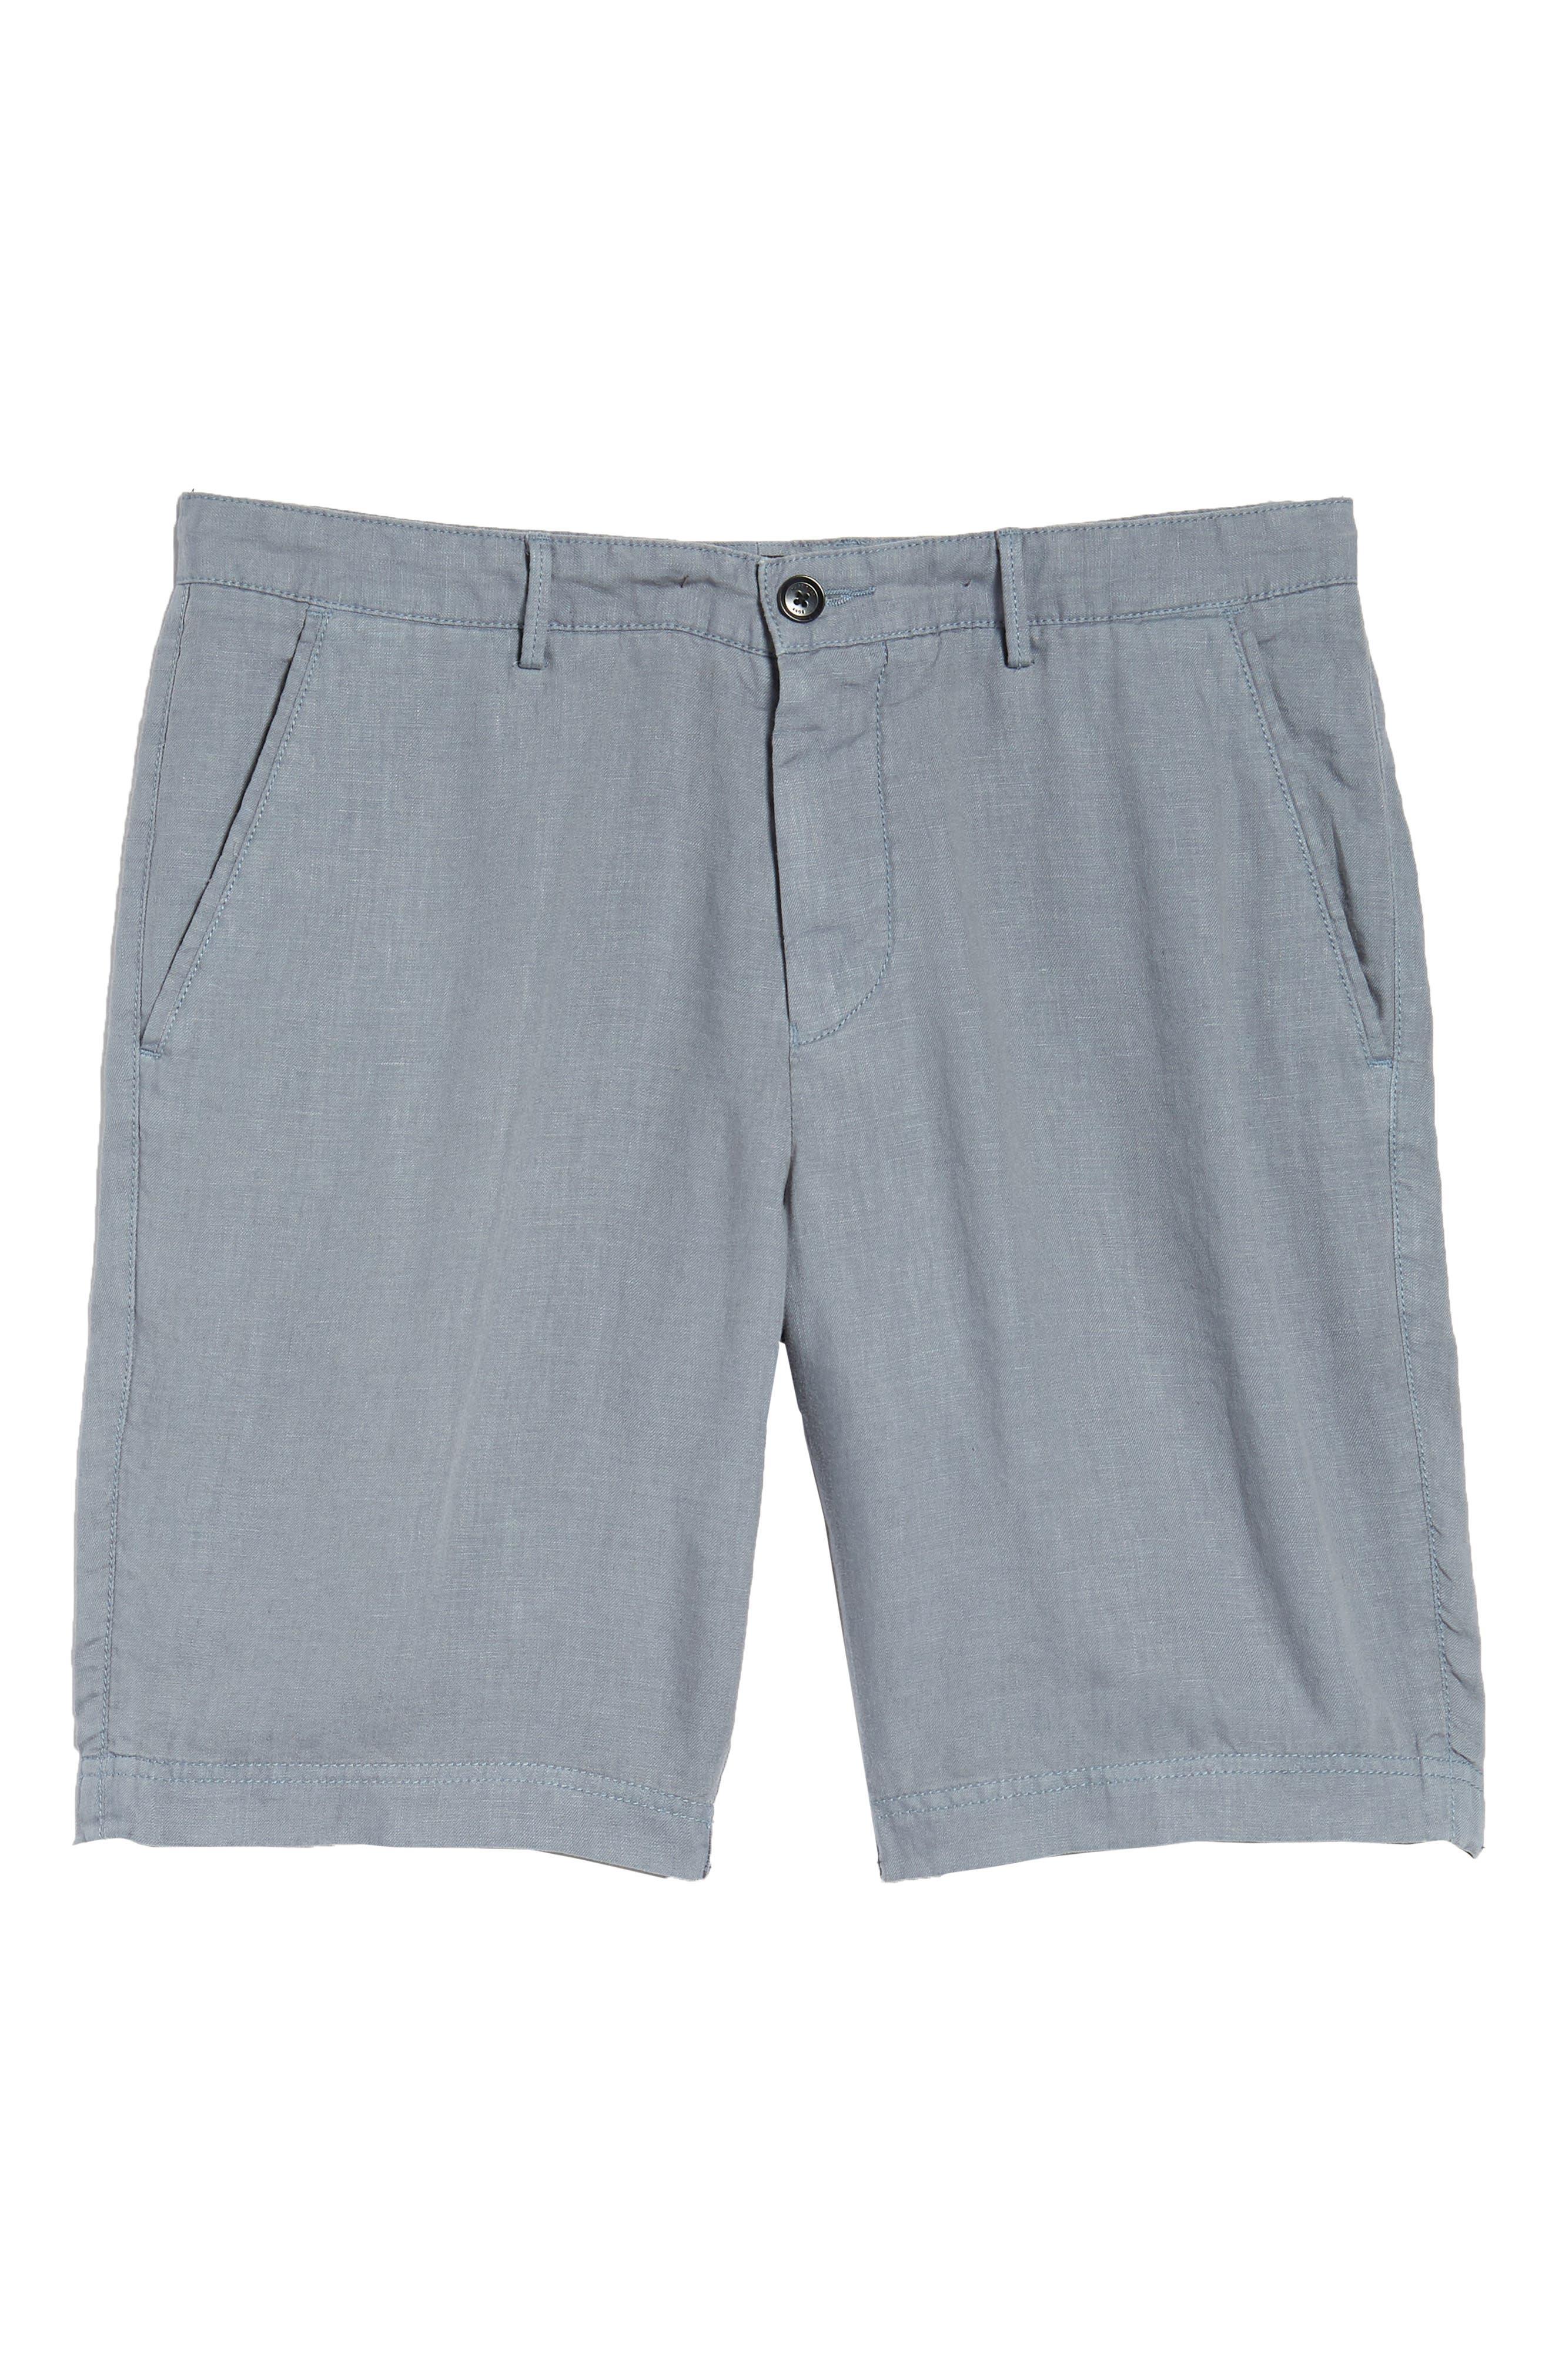 Crigan Linen Shorts,                             Alternate thumbnail 26, color,